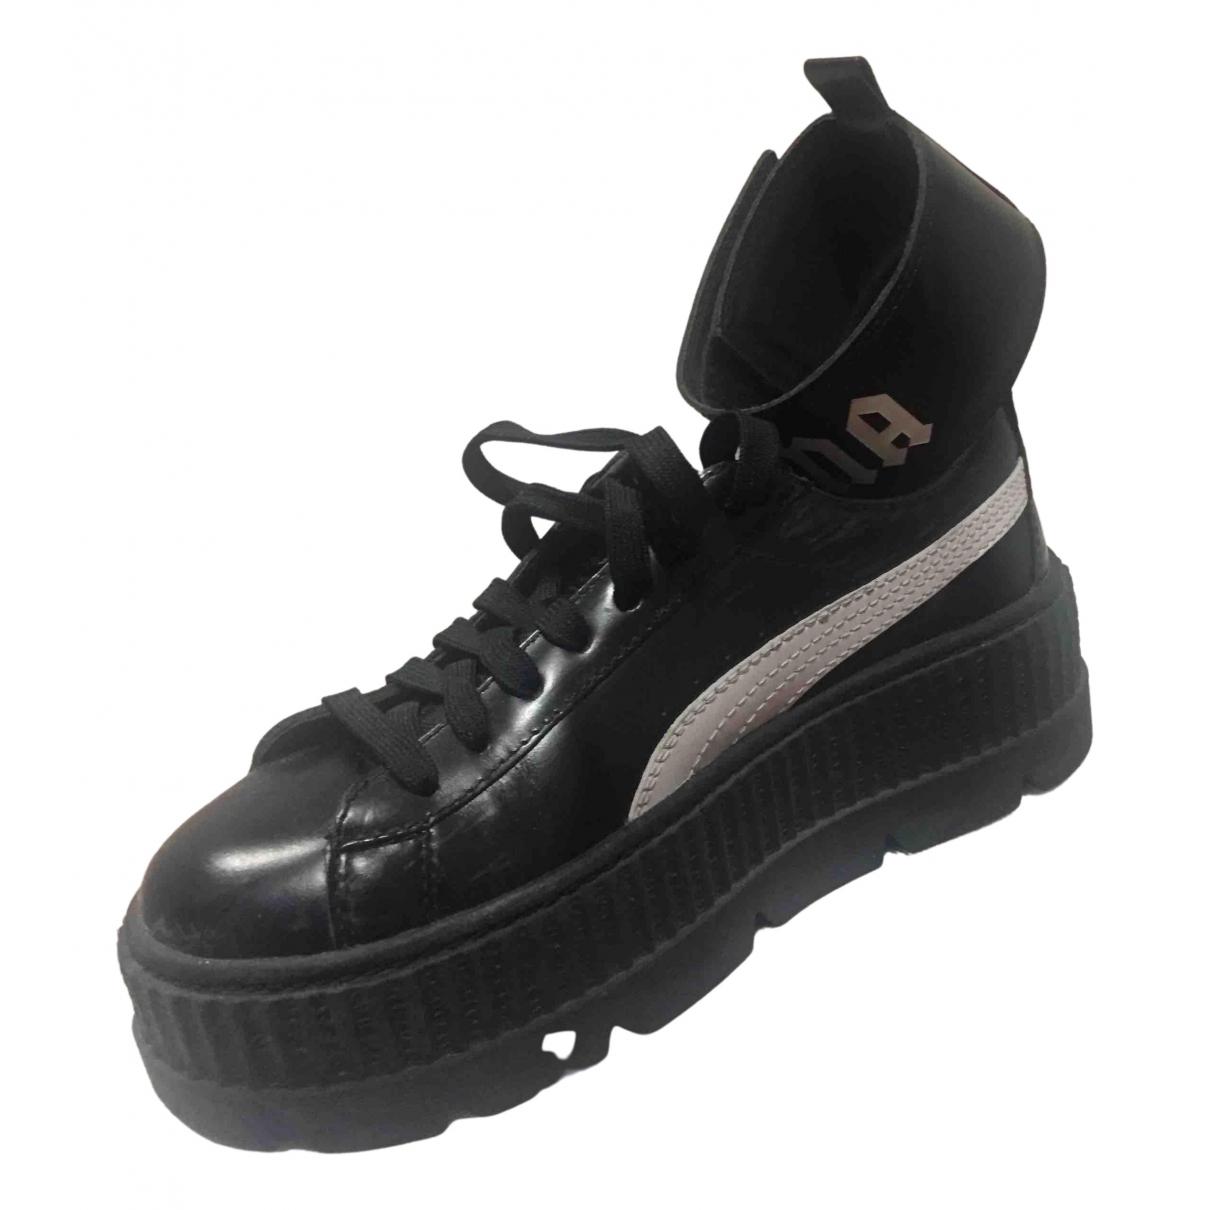 Fenty X Puma \N Sneakers in  Schwarz Kautschuk